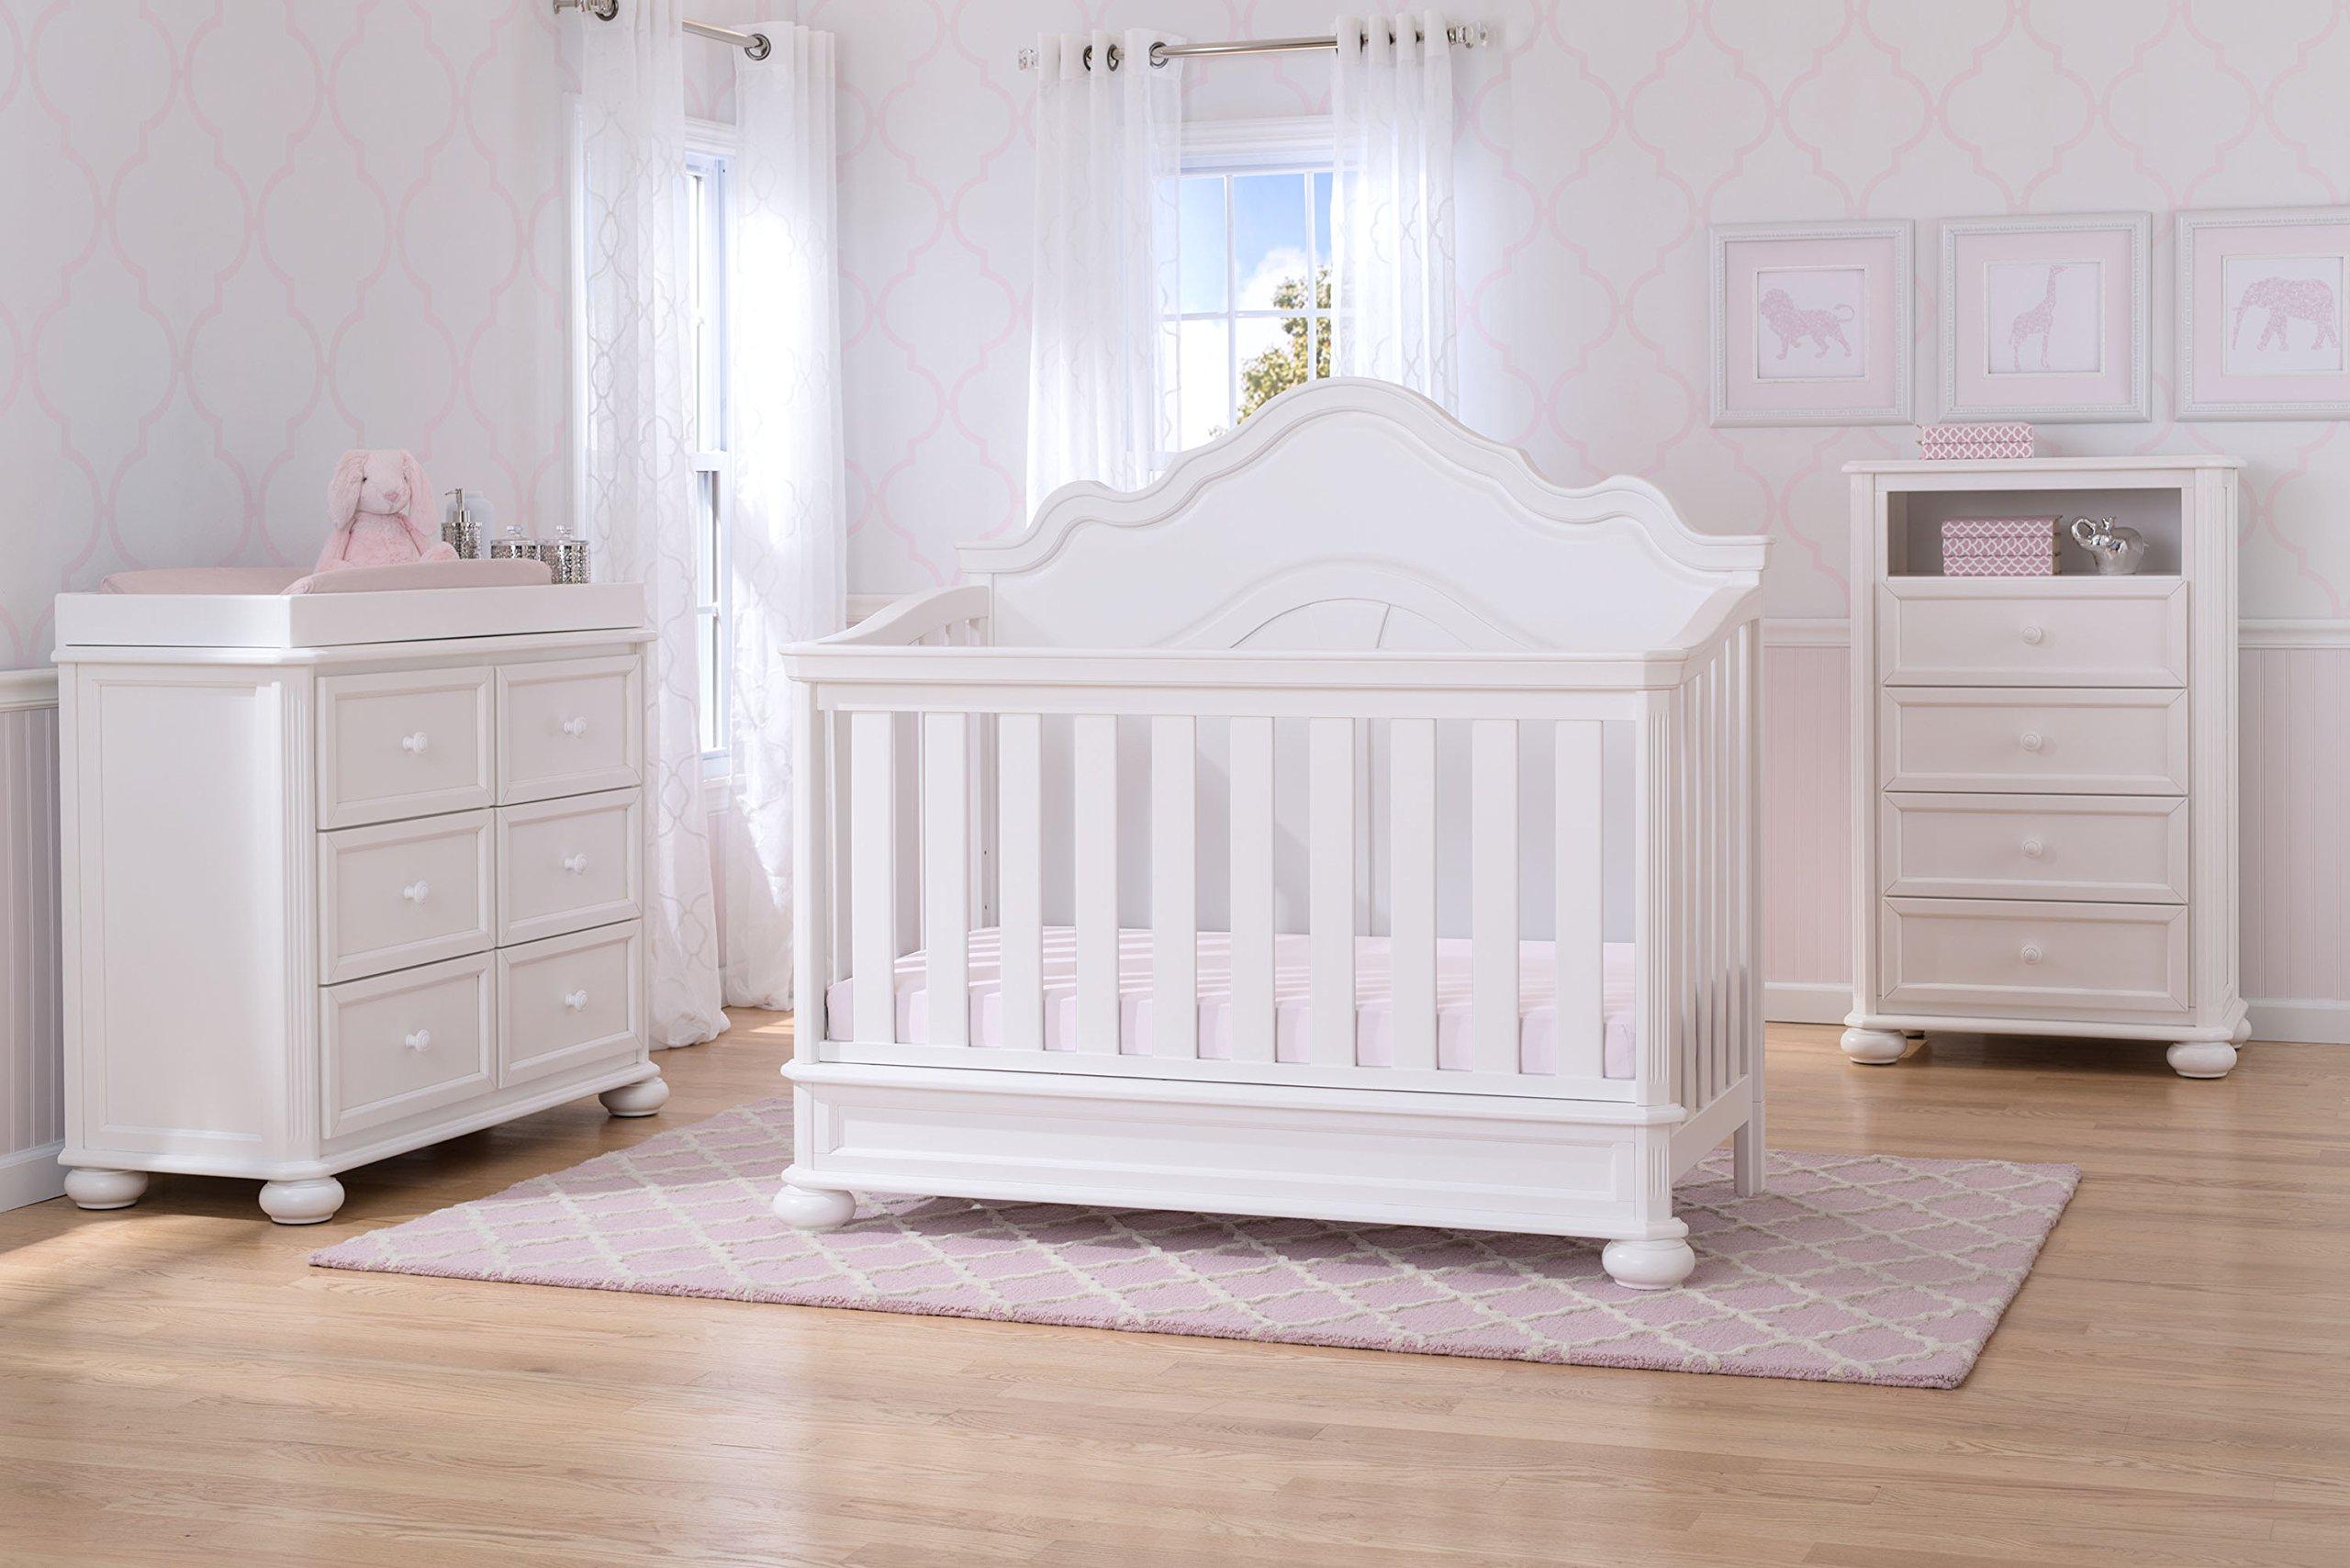 Simmons Kids Peyton 6-Piece Nursery Furniture Set (Convertible Crib, Dresser, Chest, Changing Top, Toddler Guardrail, Full Size Conversion), Bianca White by Delta Children (Image #2)